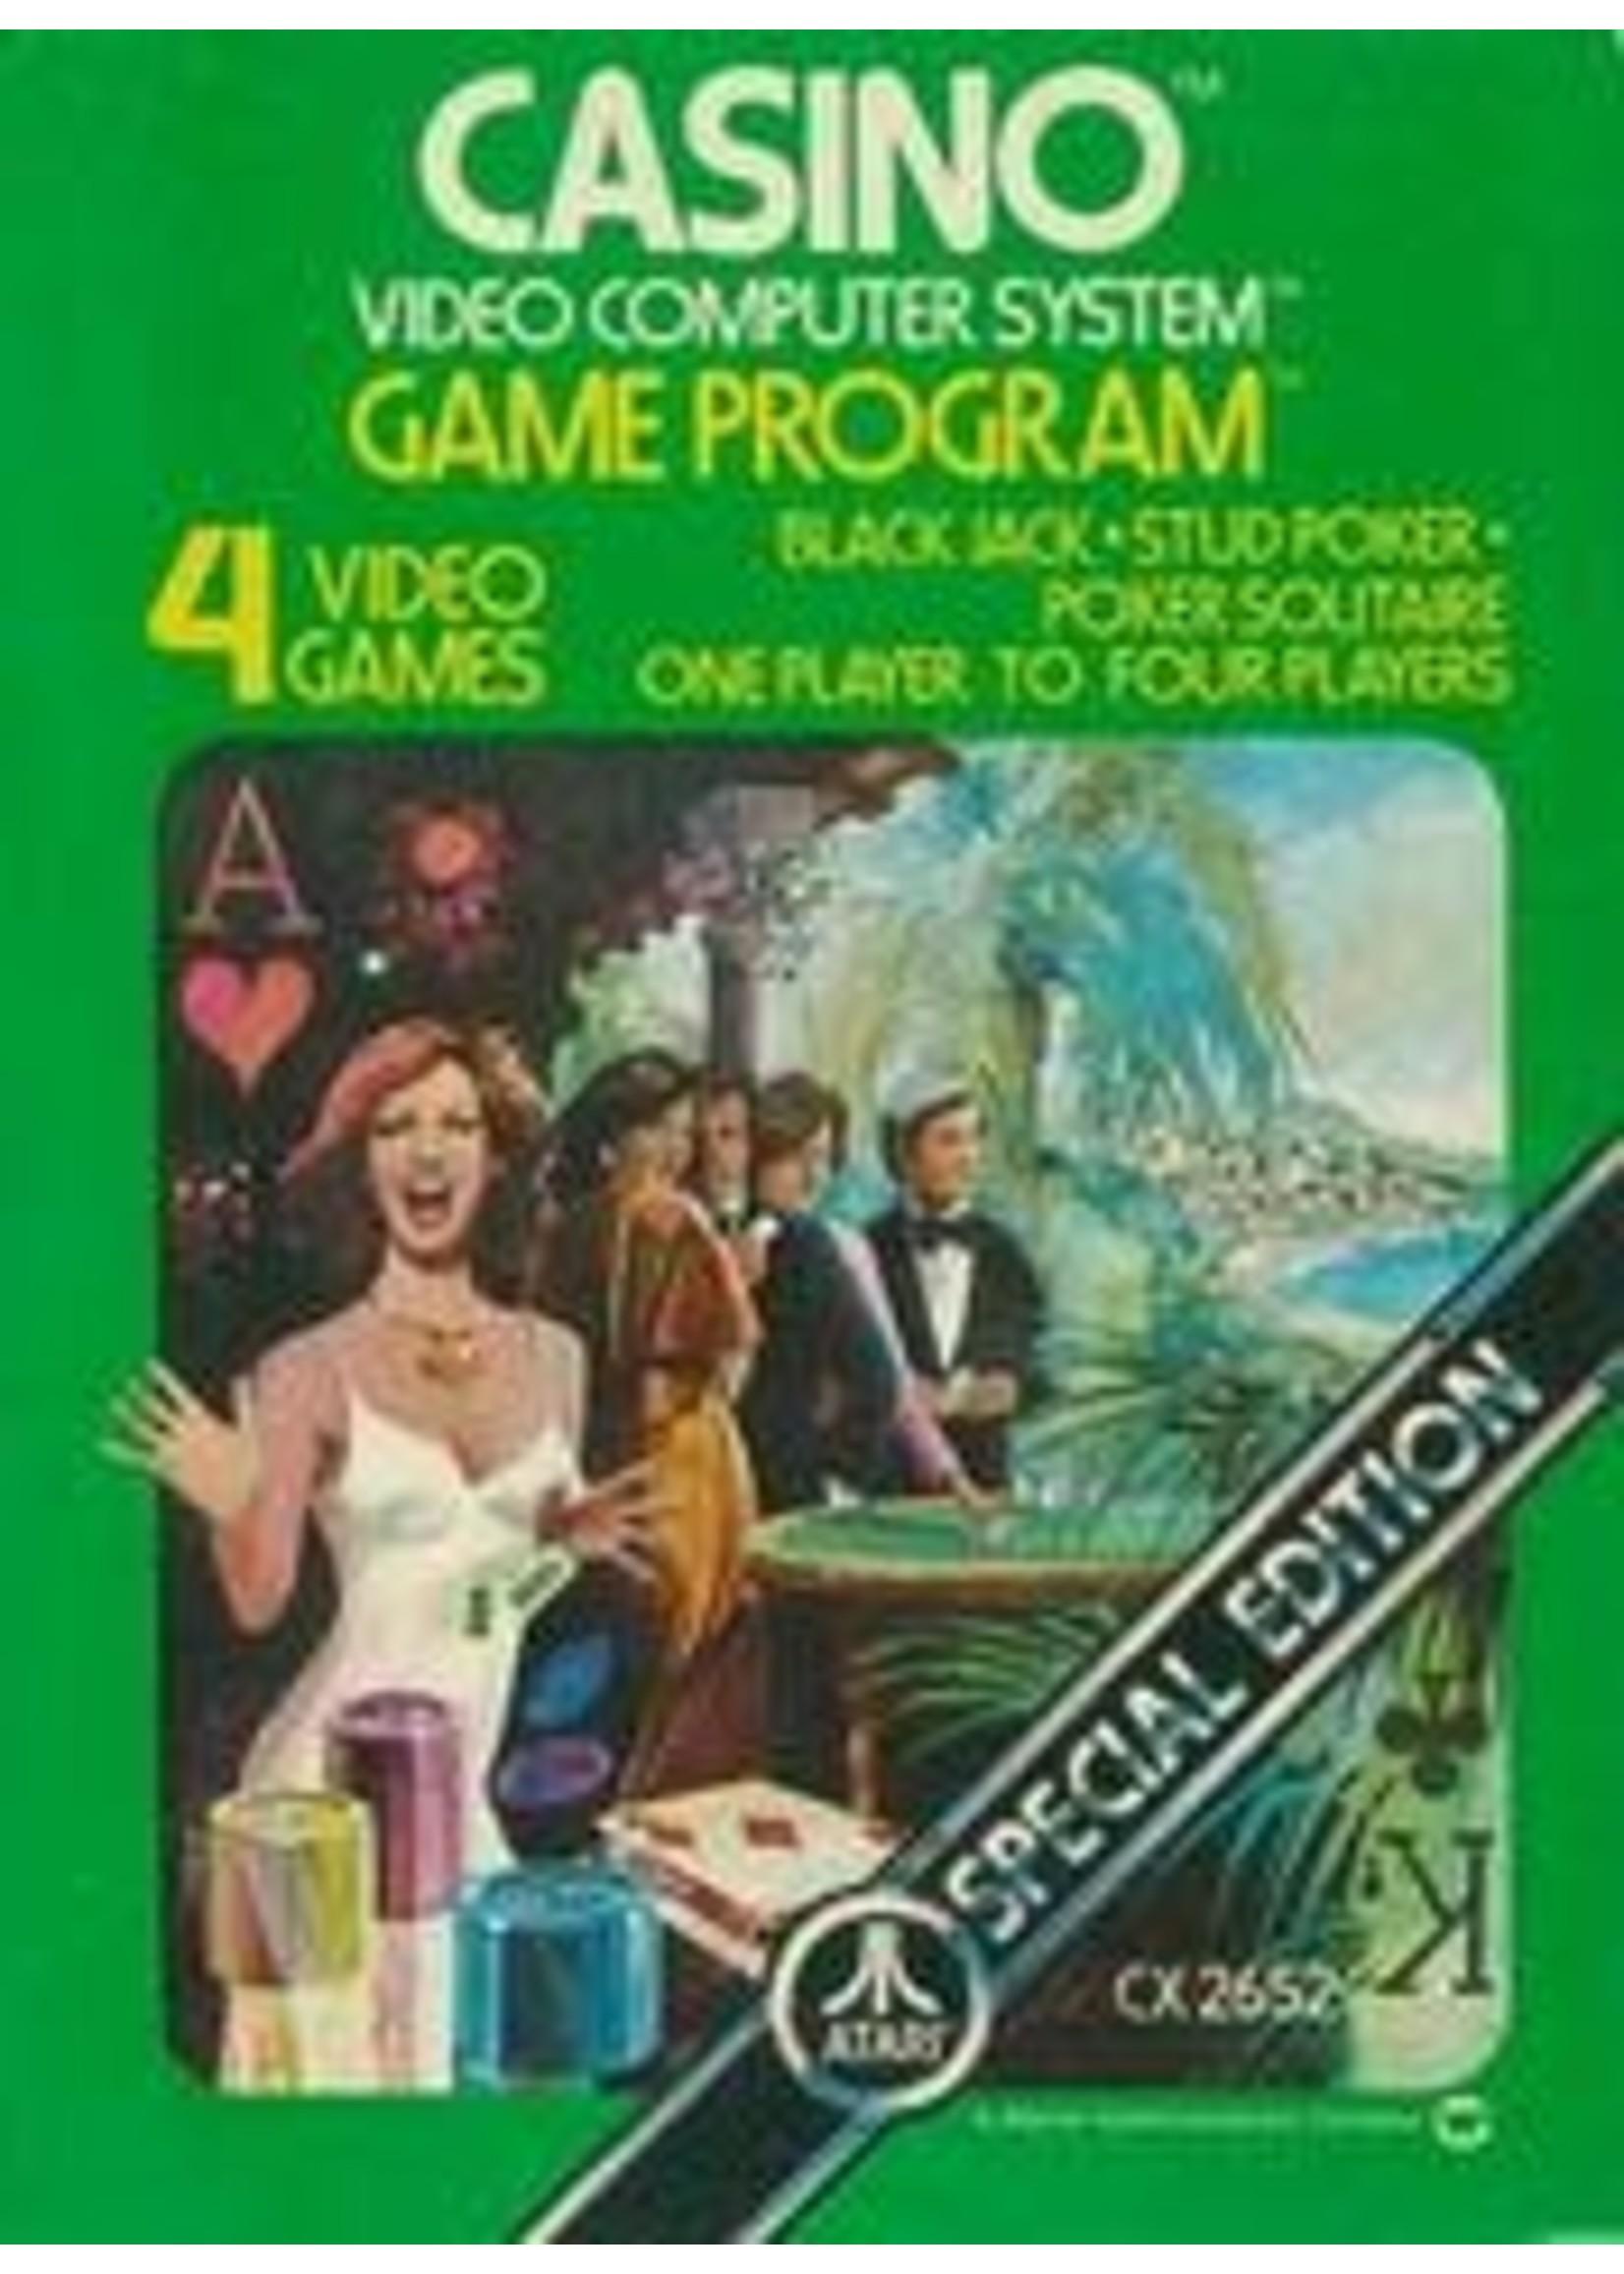 Casino Atari 2600